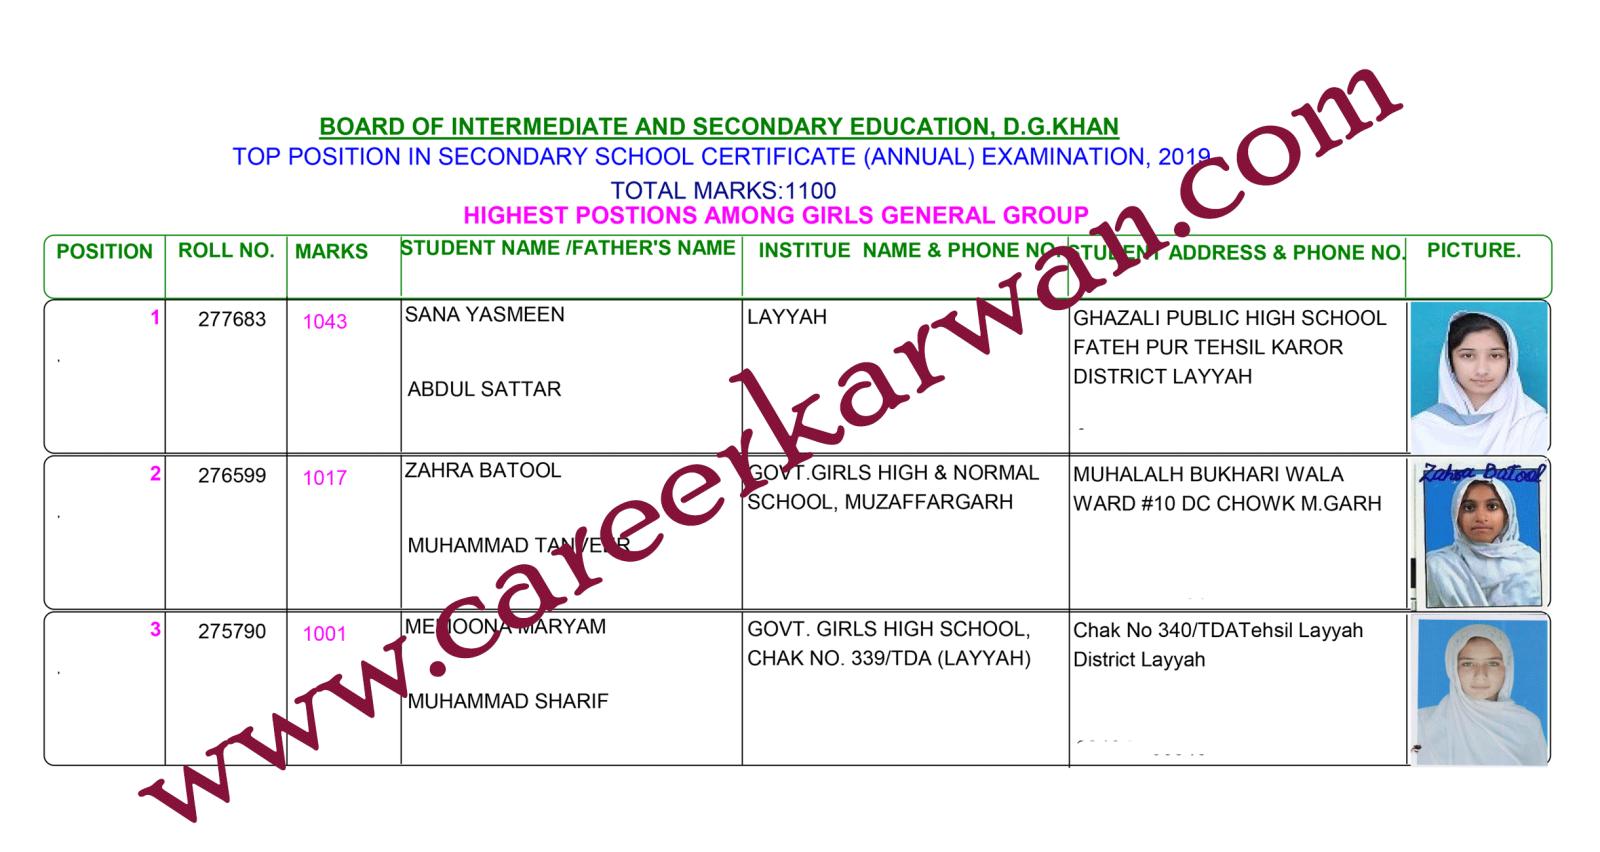 10th Class Result BISE DG Khan Board - DG Khan Board 10th